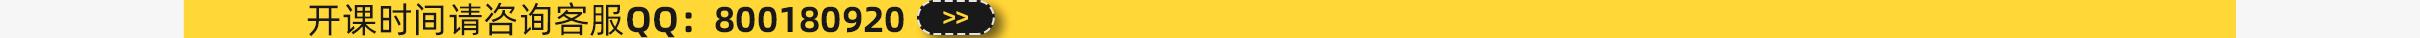 (yellow)服务模块_17.jpg